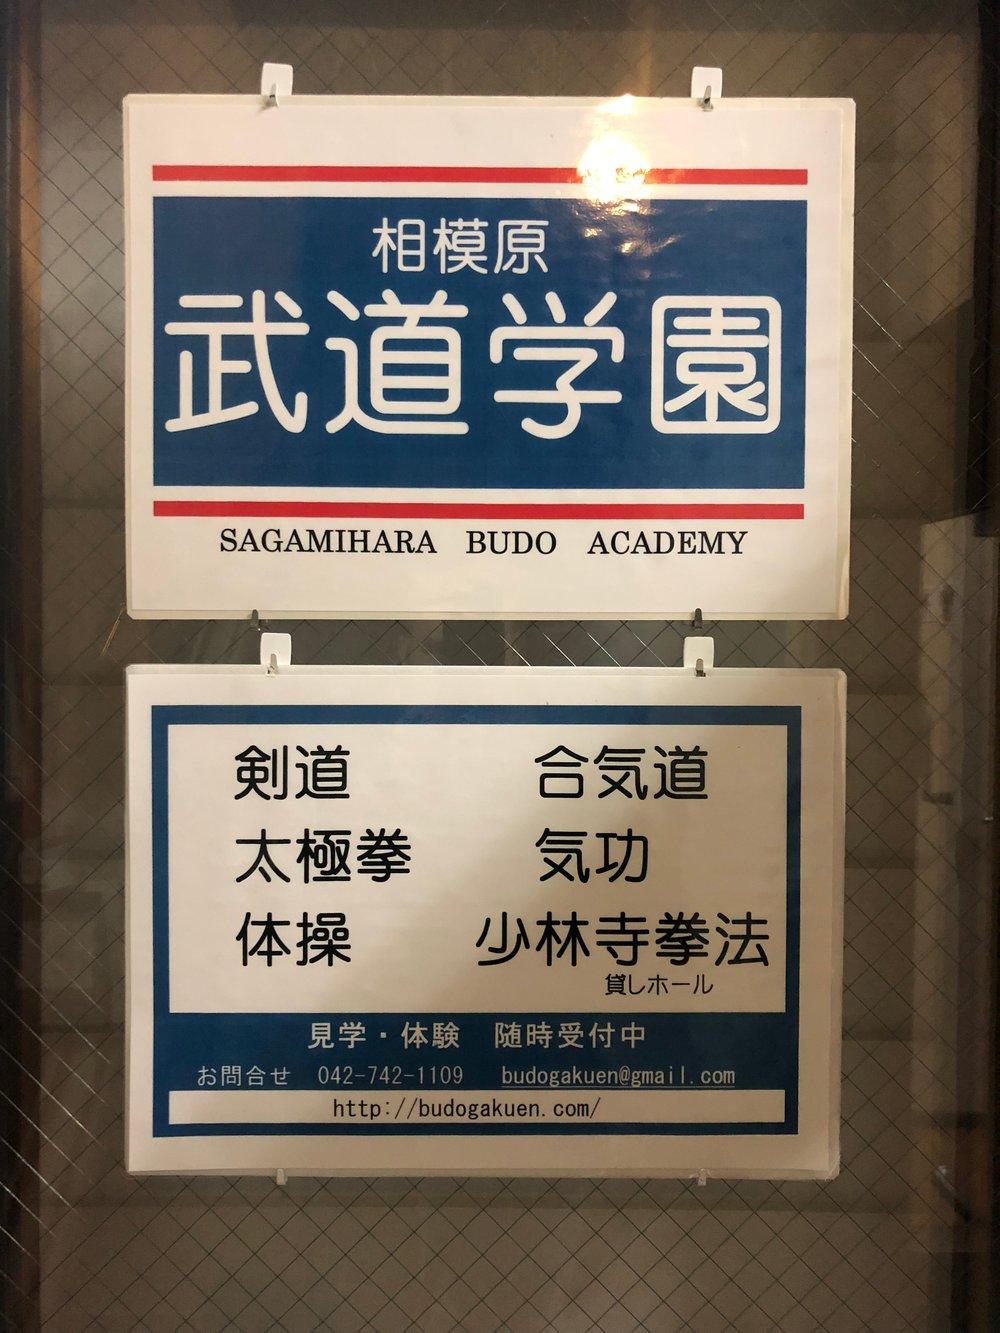 Sagamihara Budo Academy